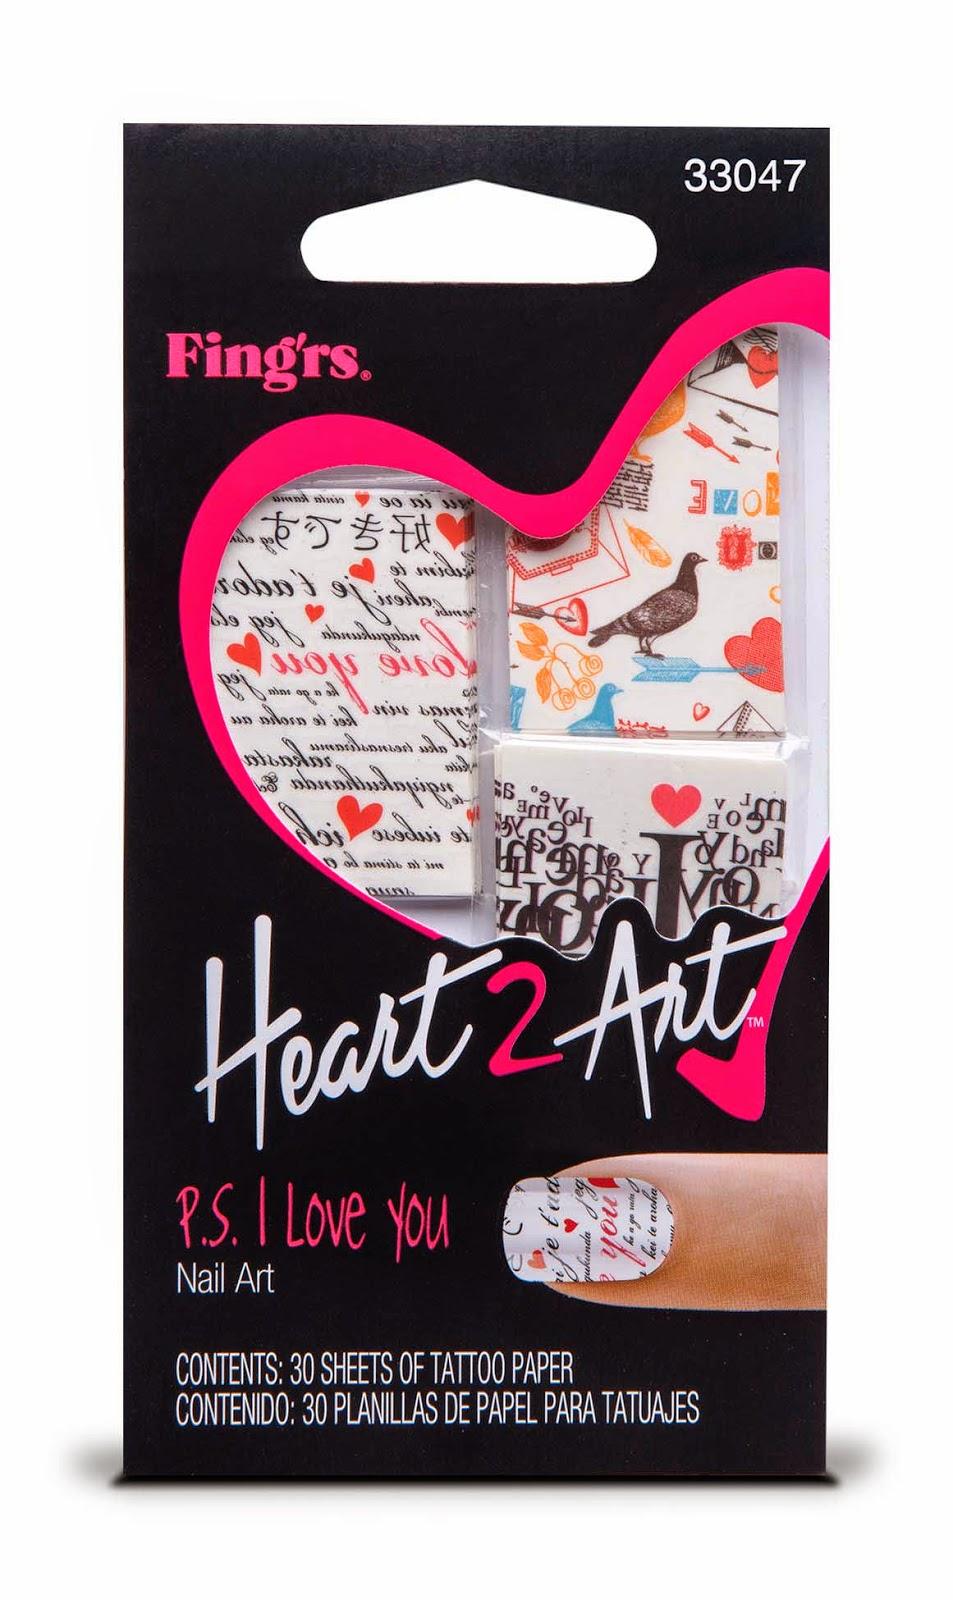 Heart2Art - P.S. I Love You